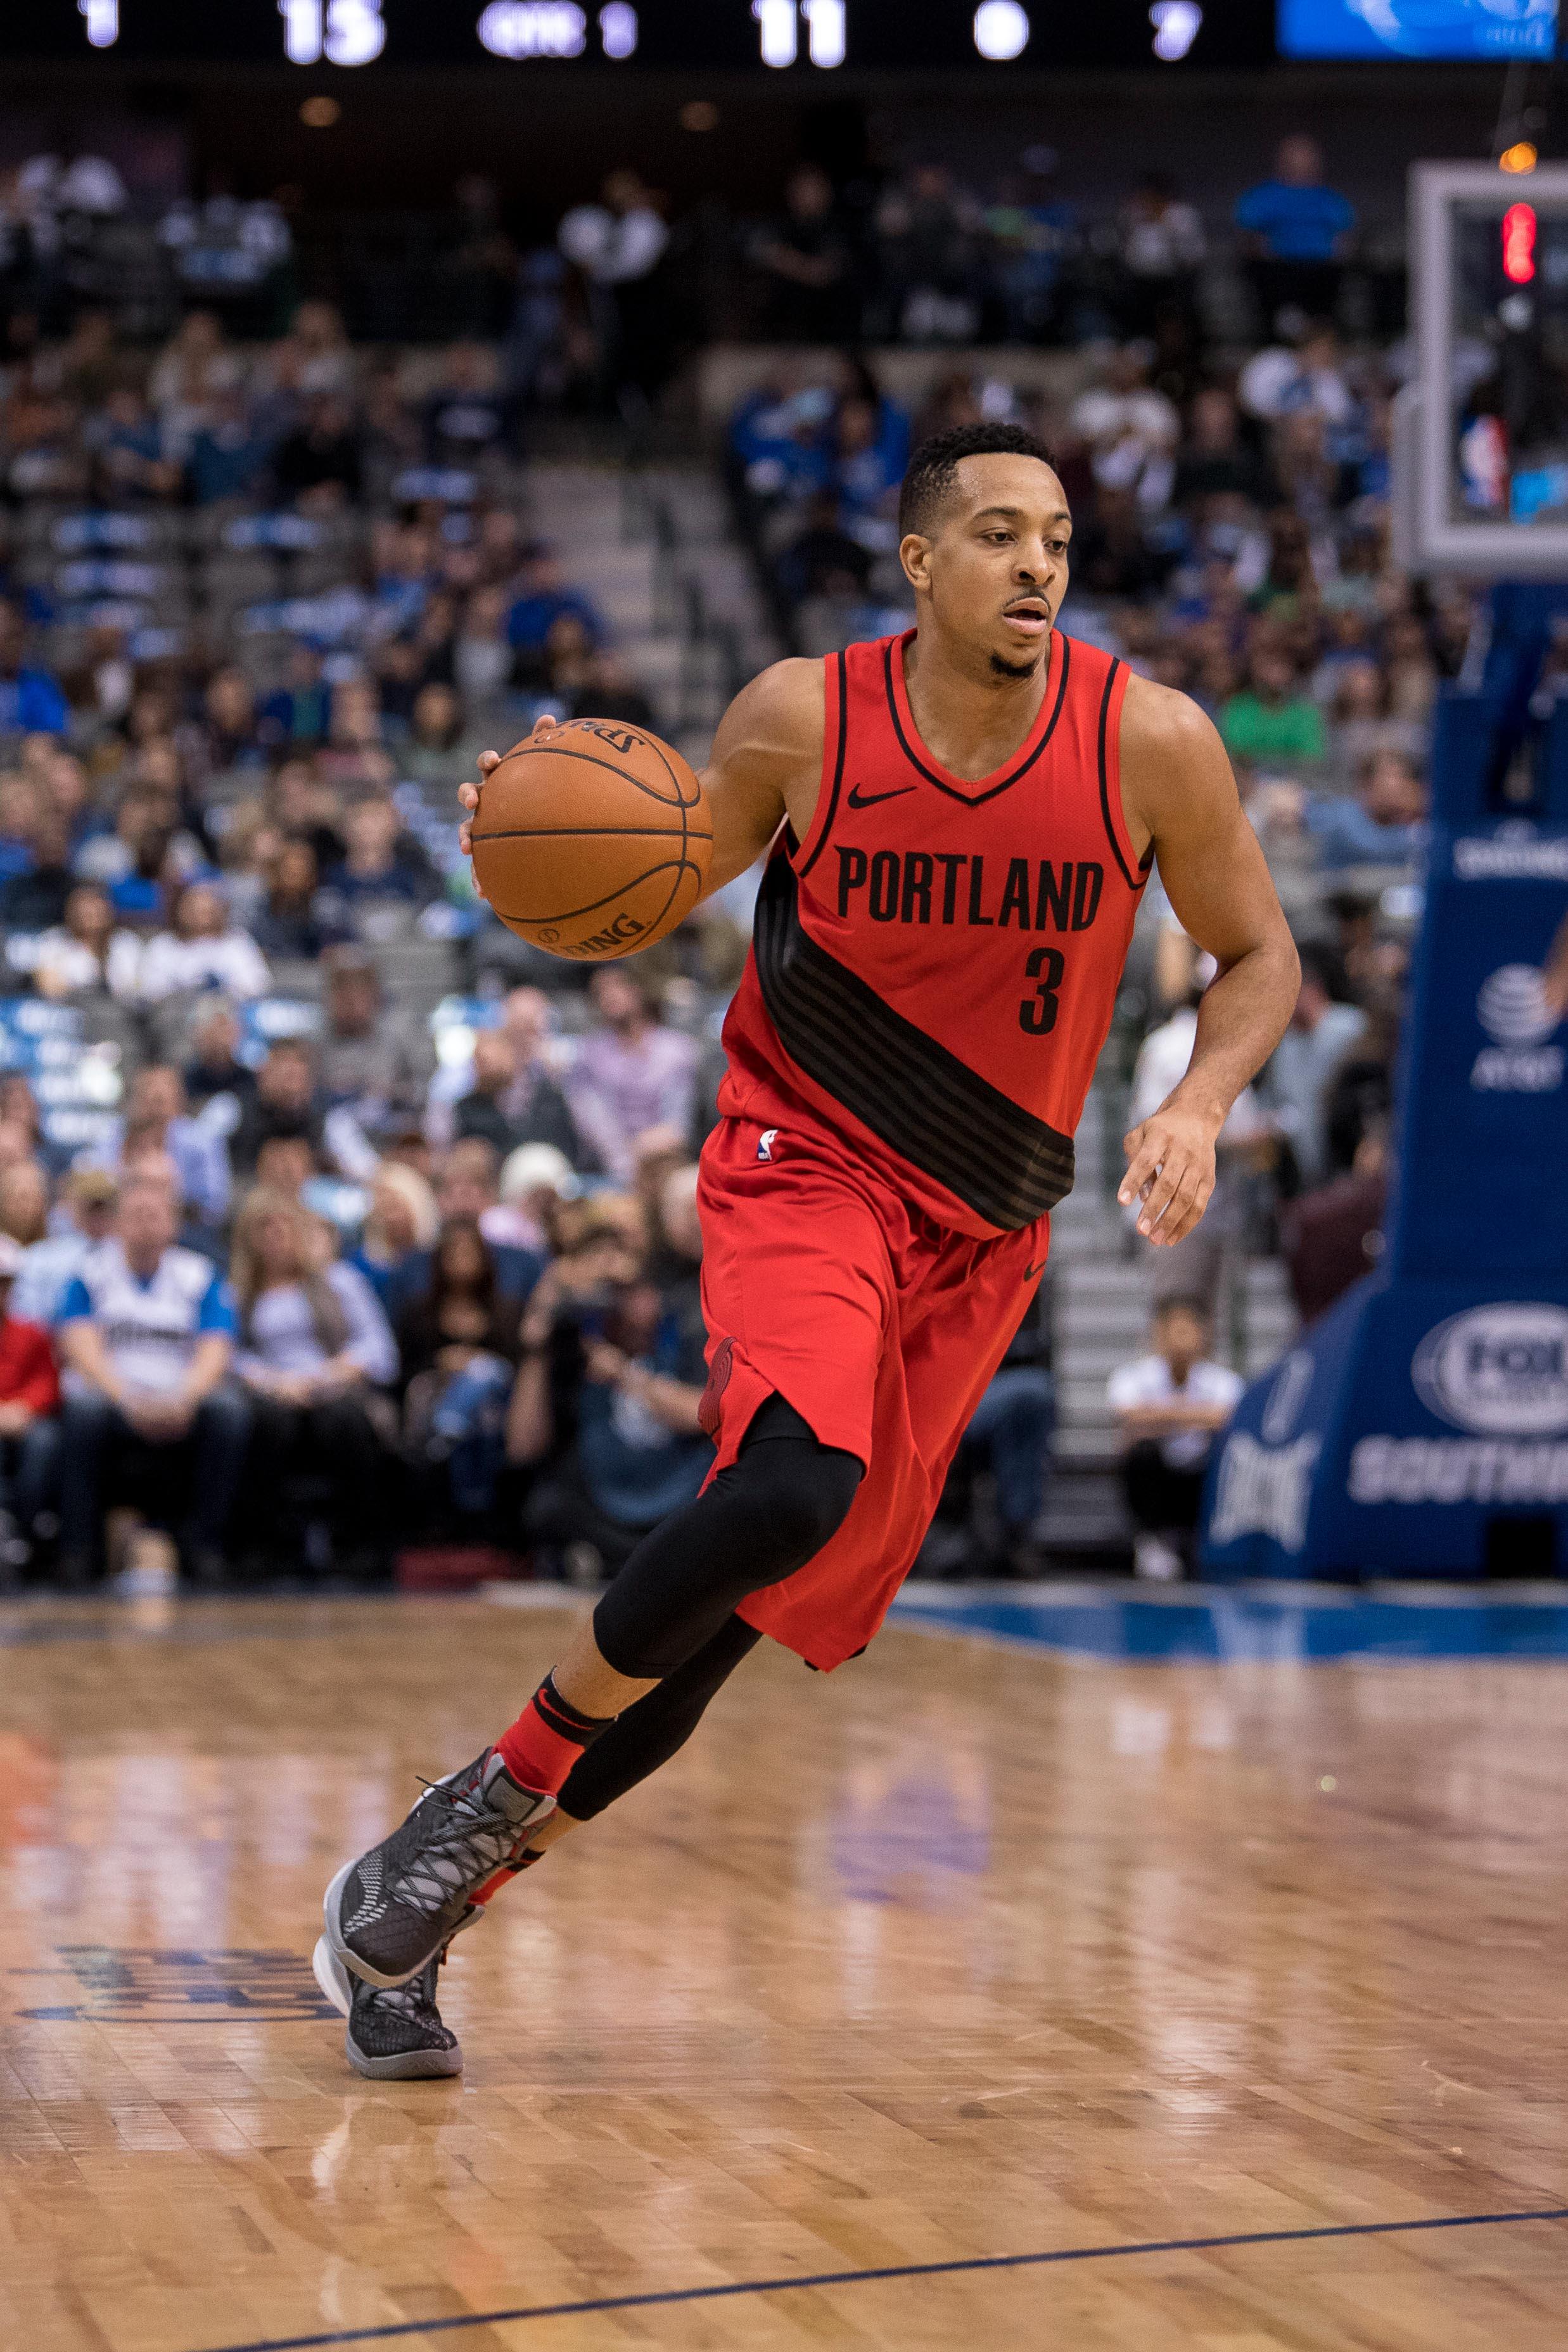 Shorthanded Celtics Host Portland Trail Blazers CelticsBlog